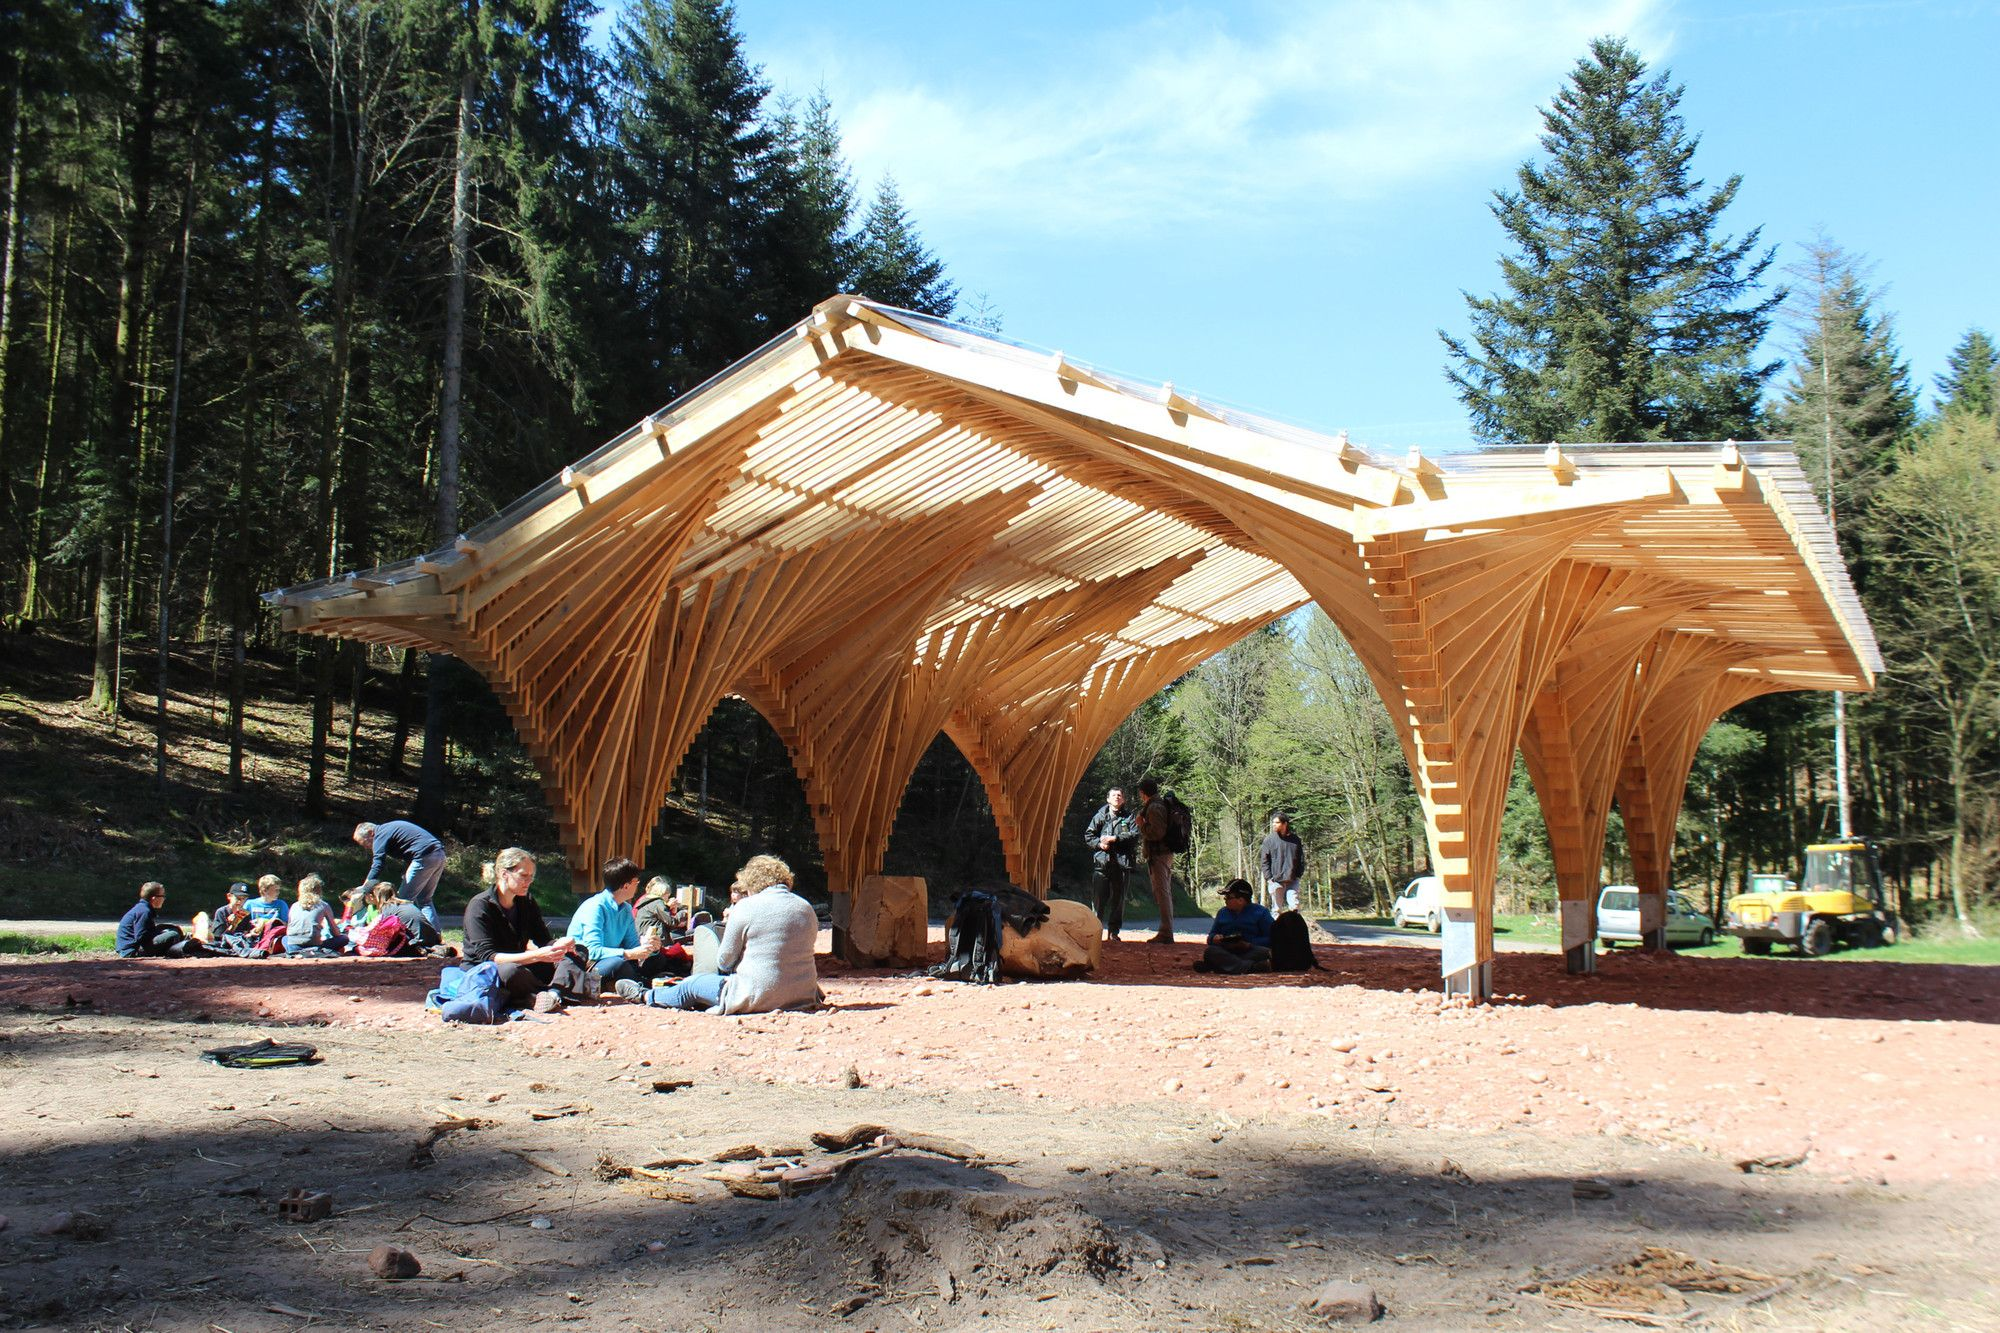 la creacin de un refugio forestal en bertrichamp studiolada architectes yoann saehr architect